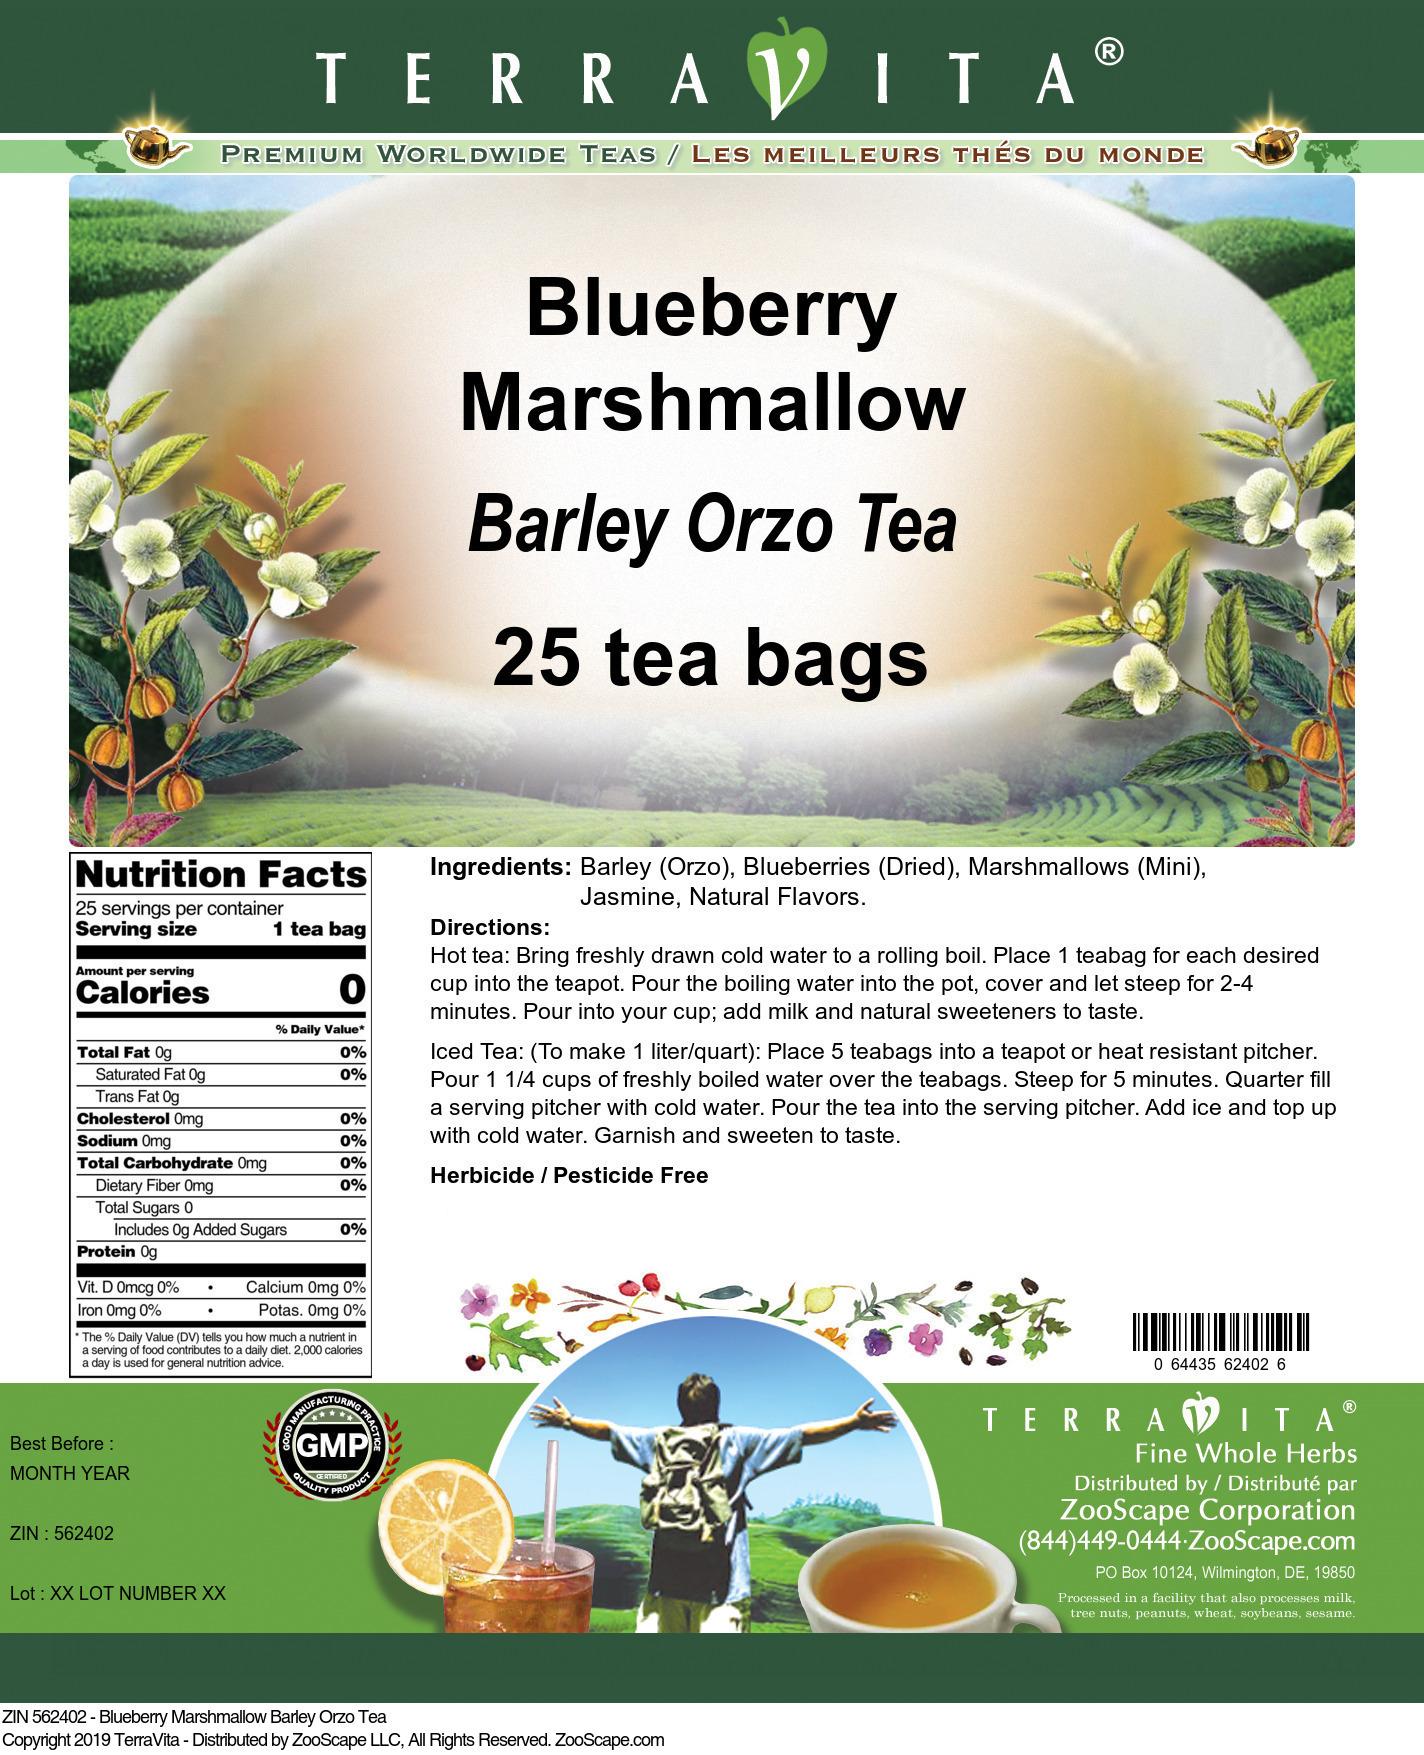 Blueberry Marshmallow Barley Orzo